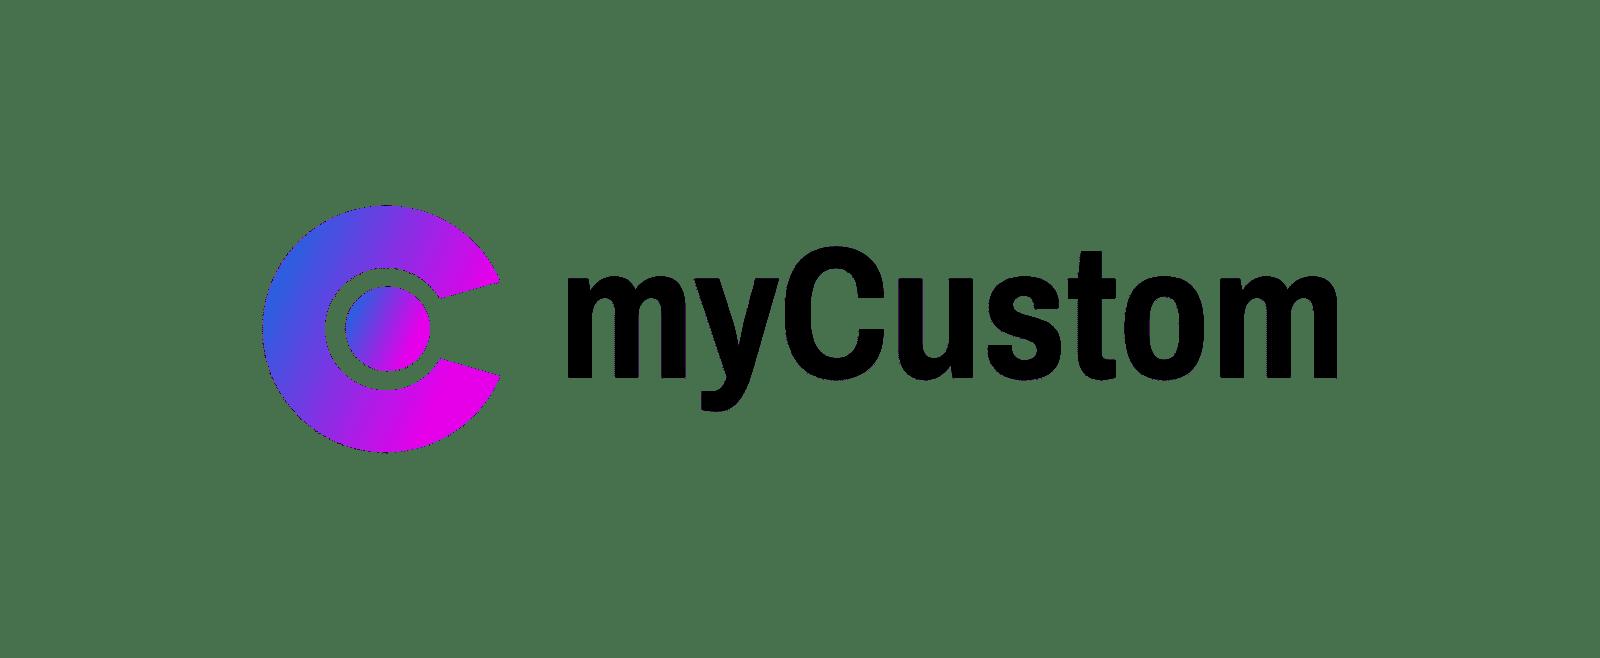 mycustom